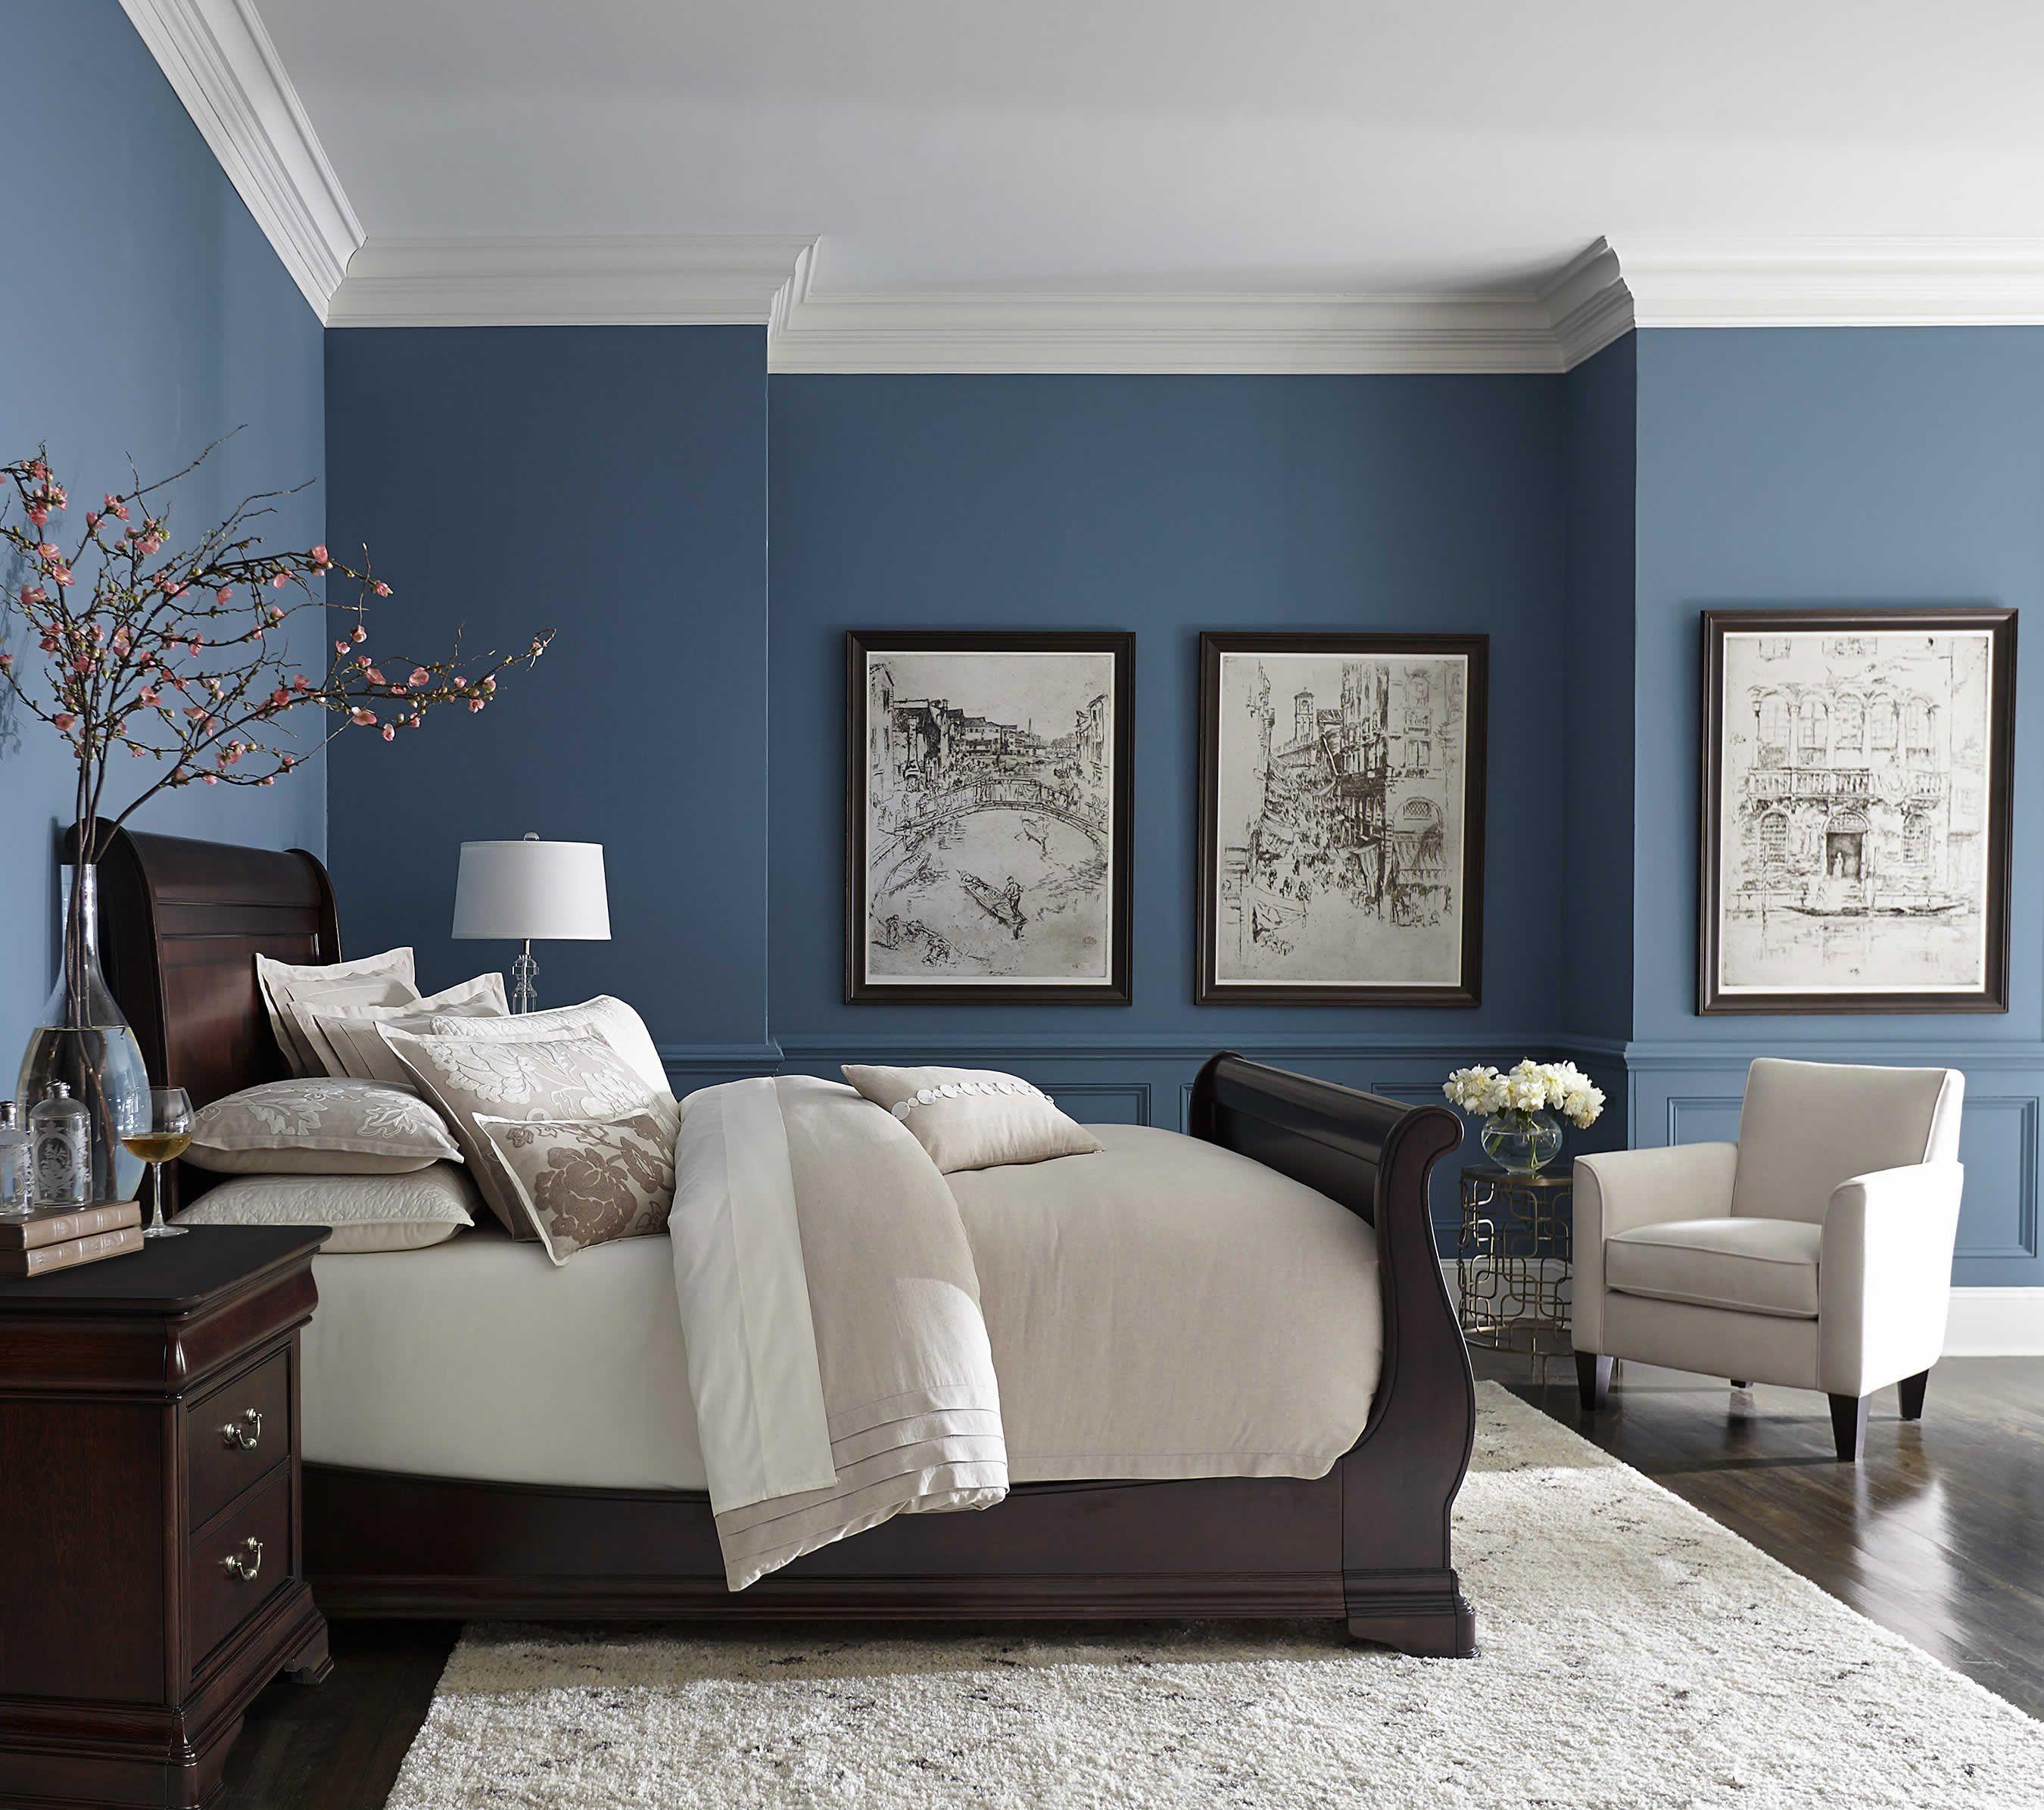 30 Inspiration Picture Of Dark Bedroom Furniture Janicereyesphotography Com Small Master Bedroom Master Bedrooms Decor Master Bedroom Colors